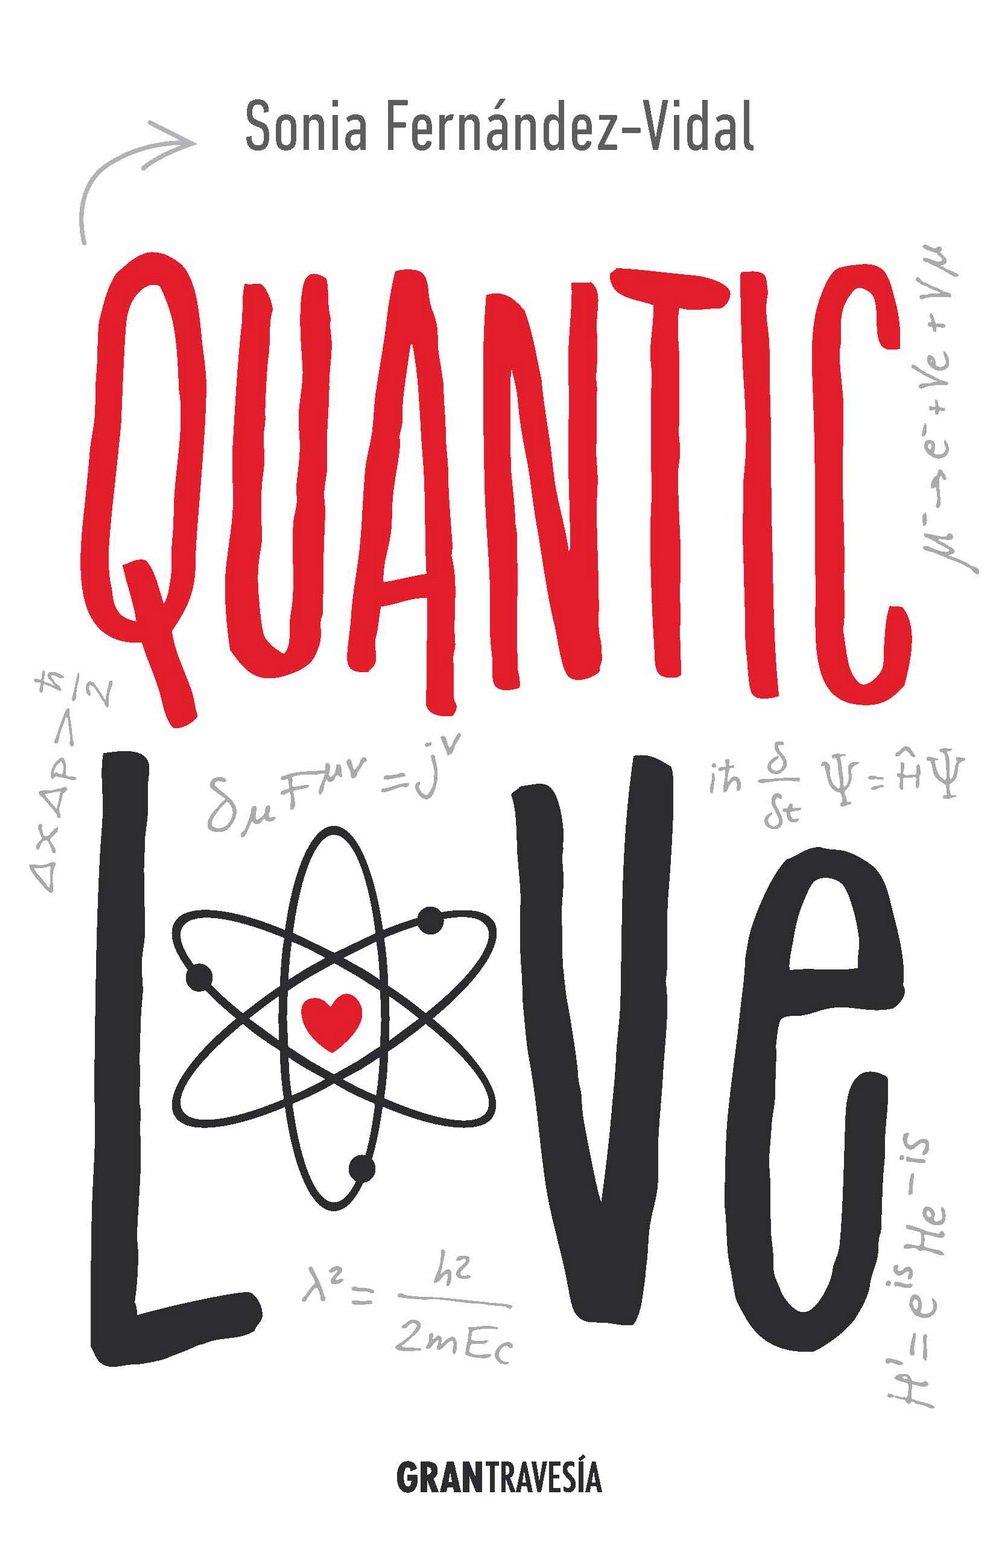 Quantic love (Spanish Edition): Sonia Fernández-Vidal: 9786077353133: Amazon.com: Books